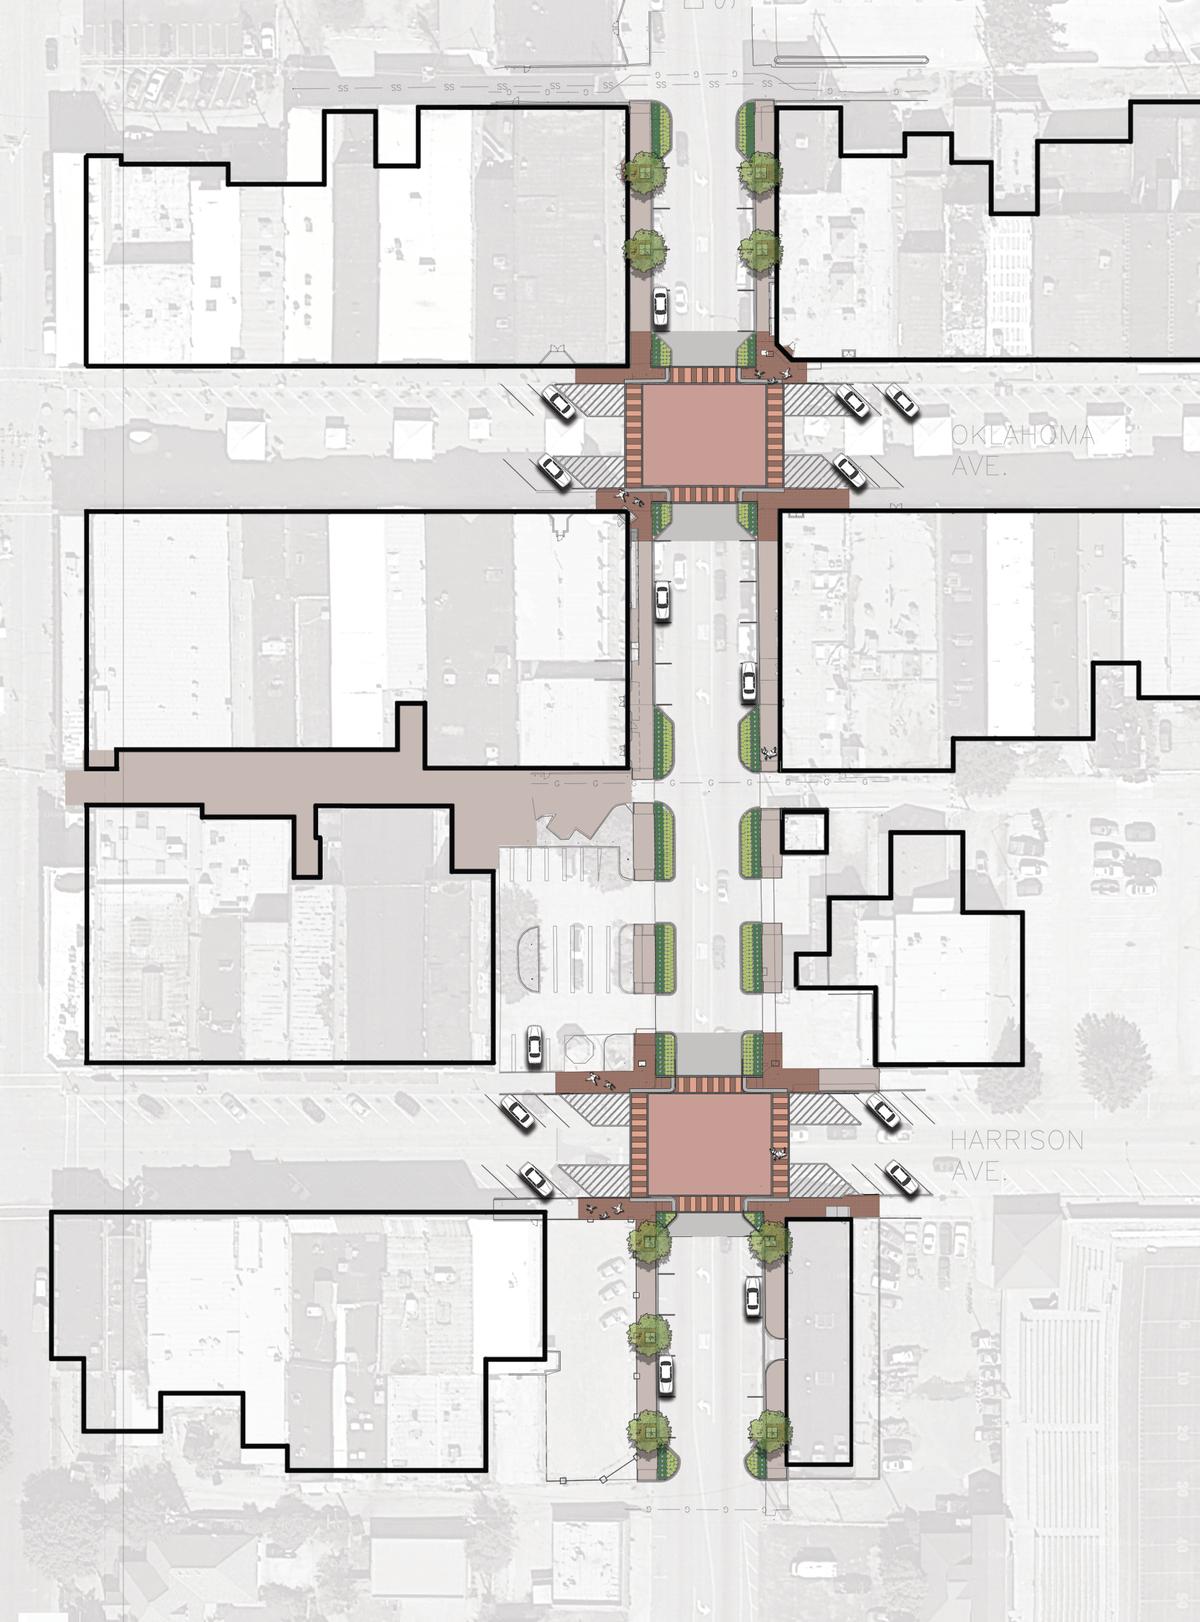 Division Street Improvments 24x36_Option B.jpg